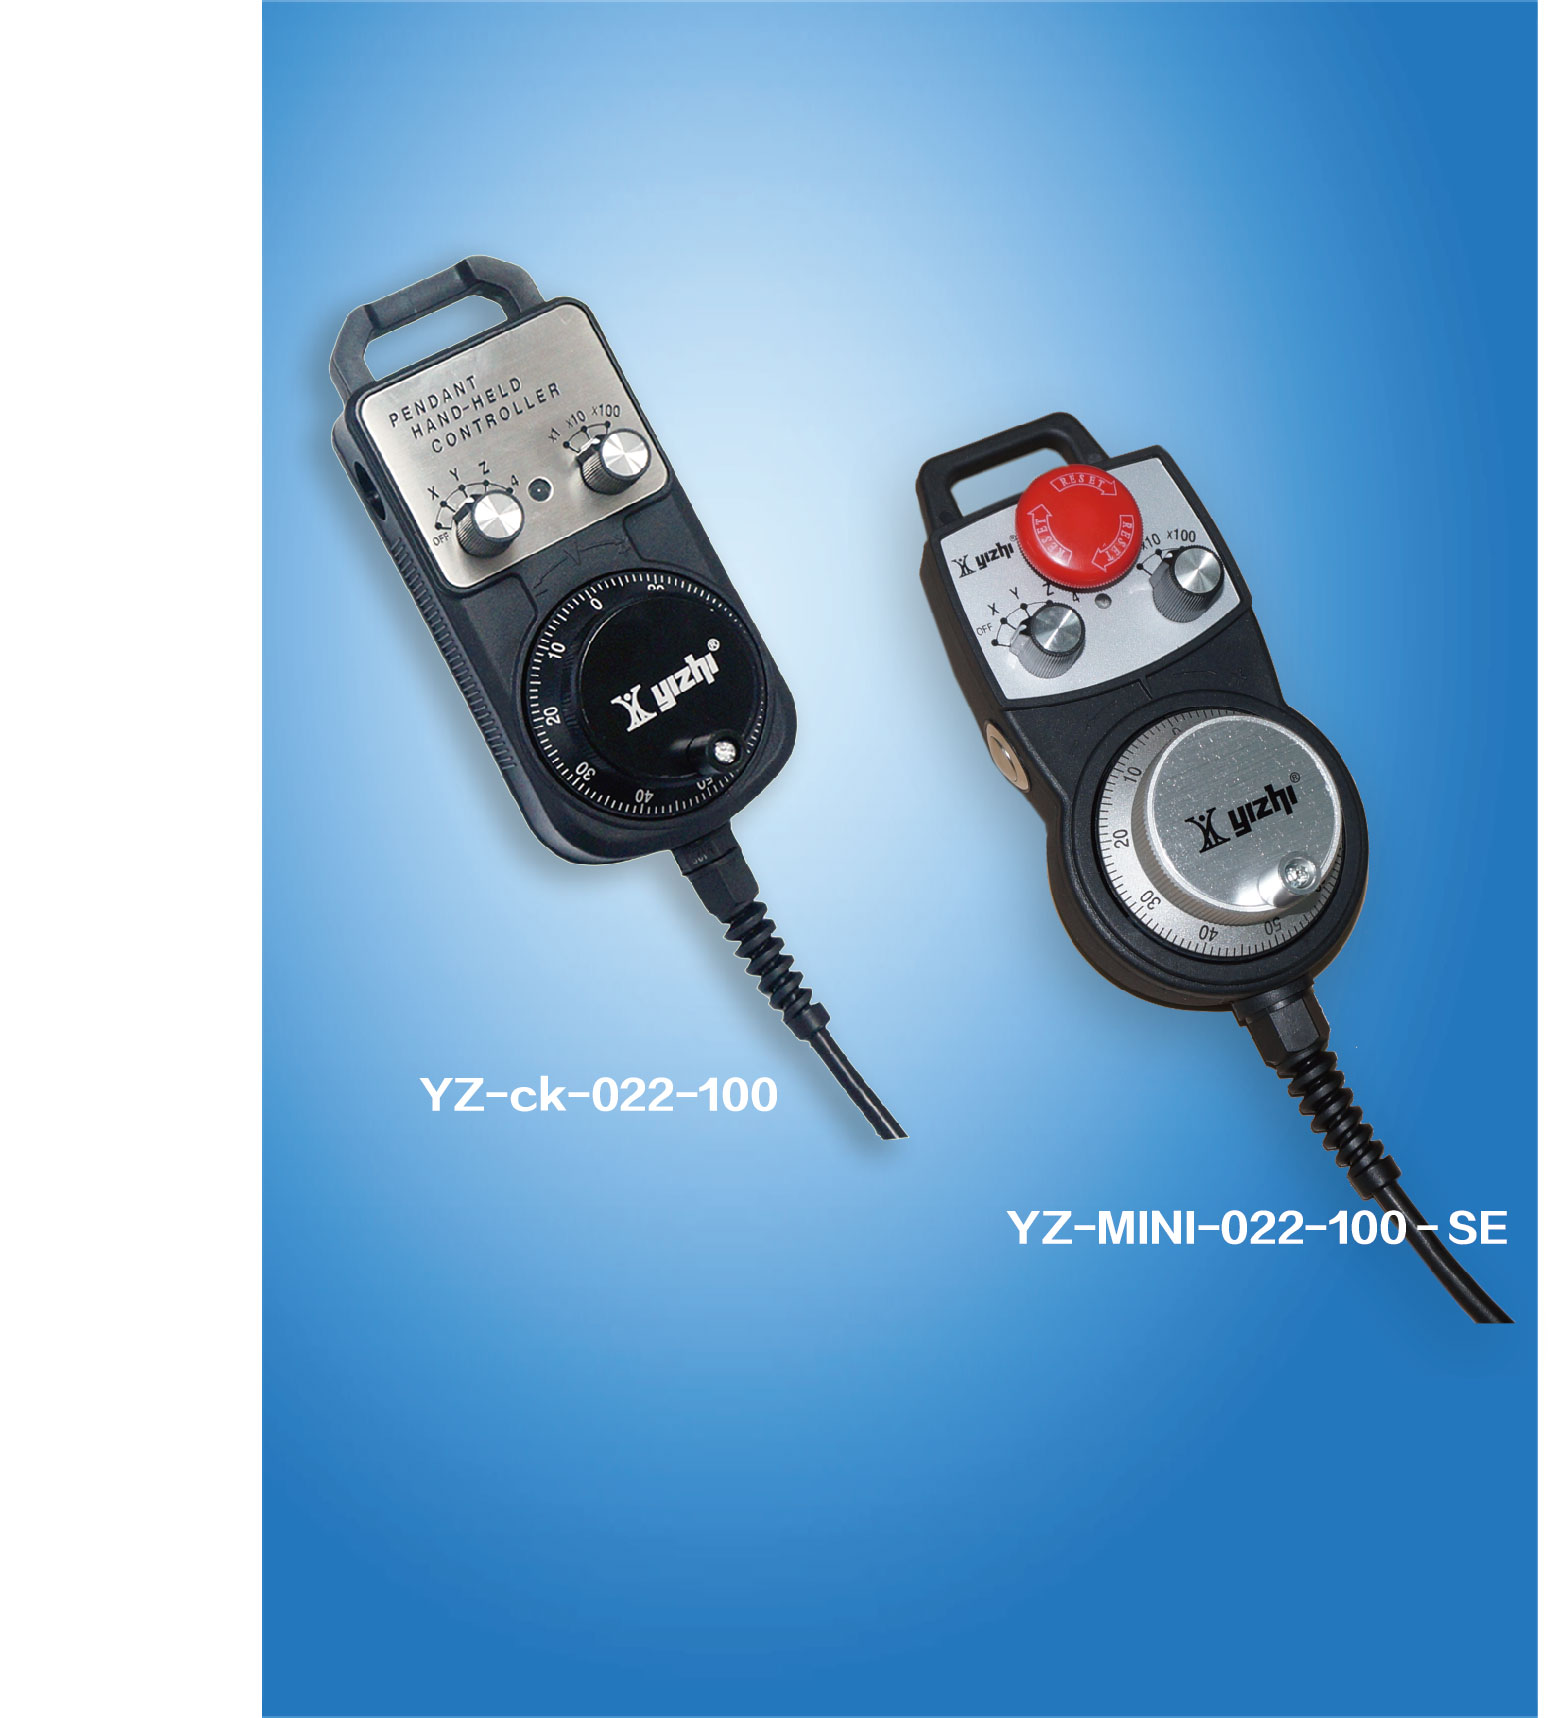 YIZHI智能纠错抗振型数字电子手轮,国家专利产品,适配任何CNC数控系统及PLC